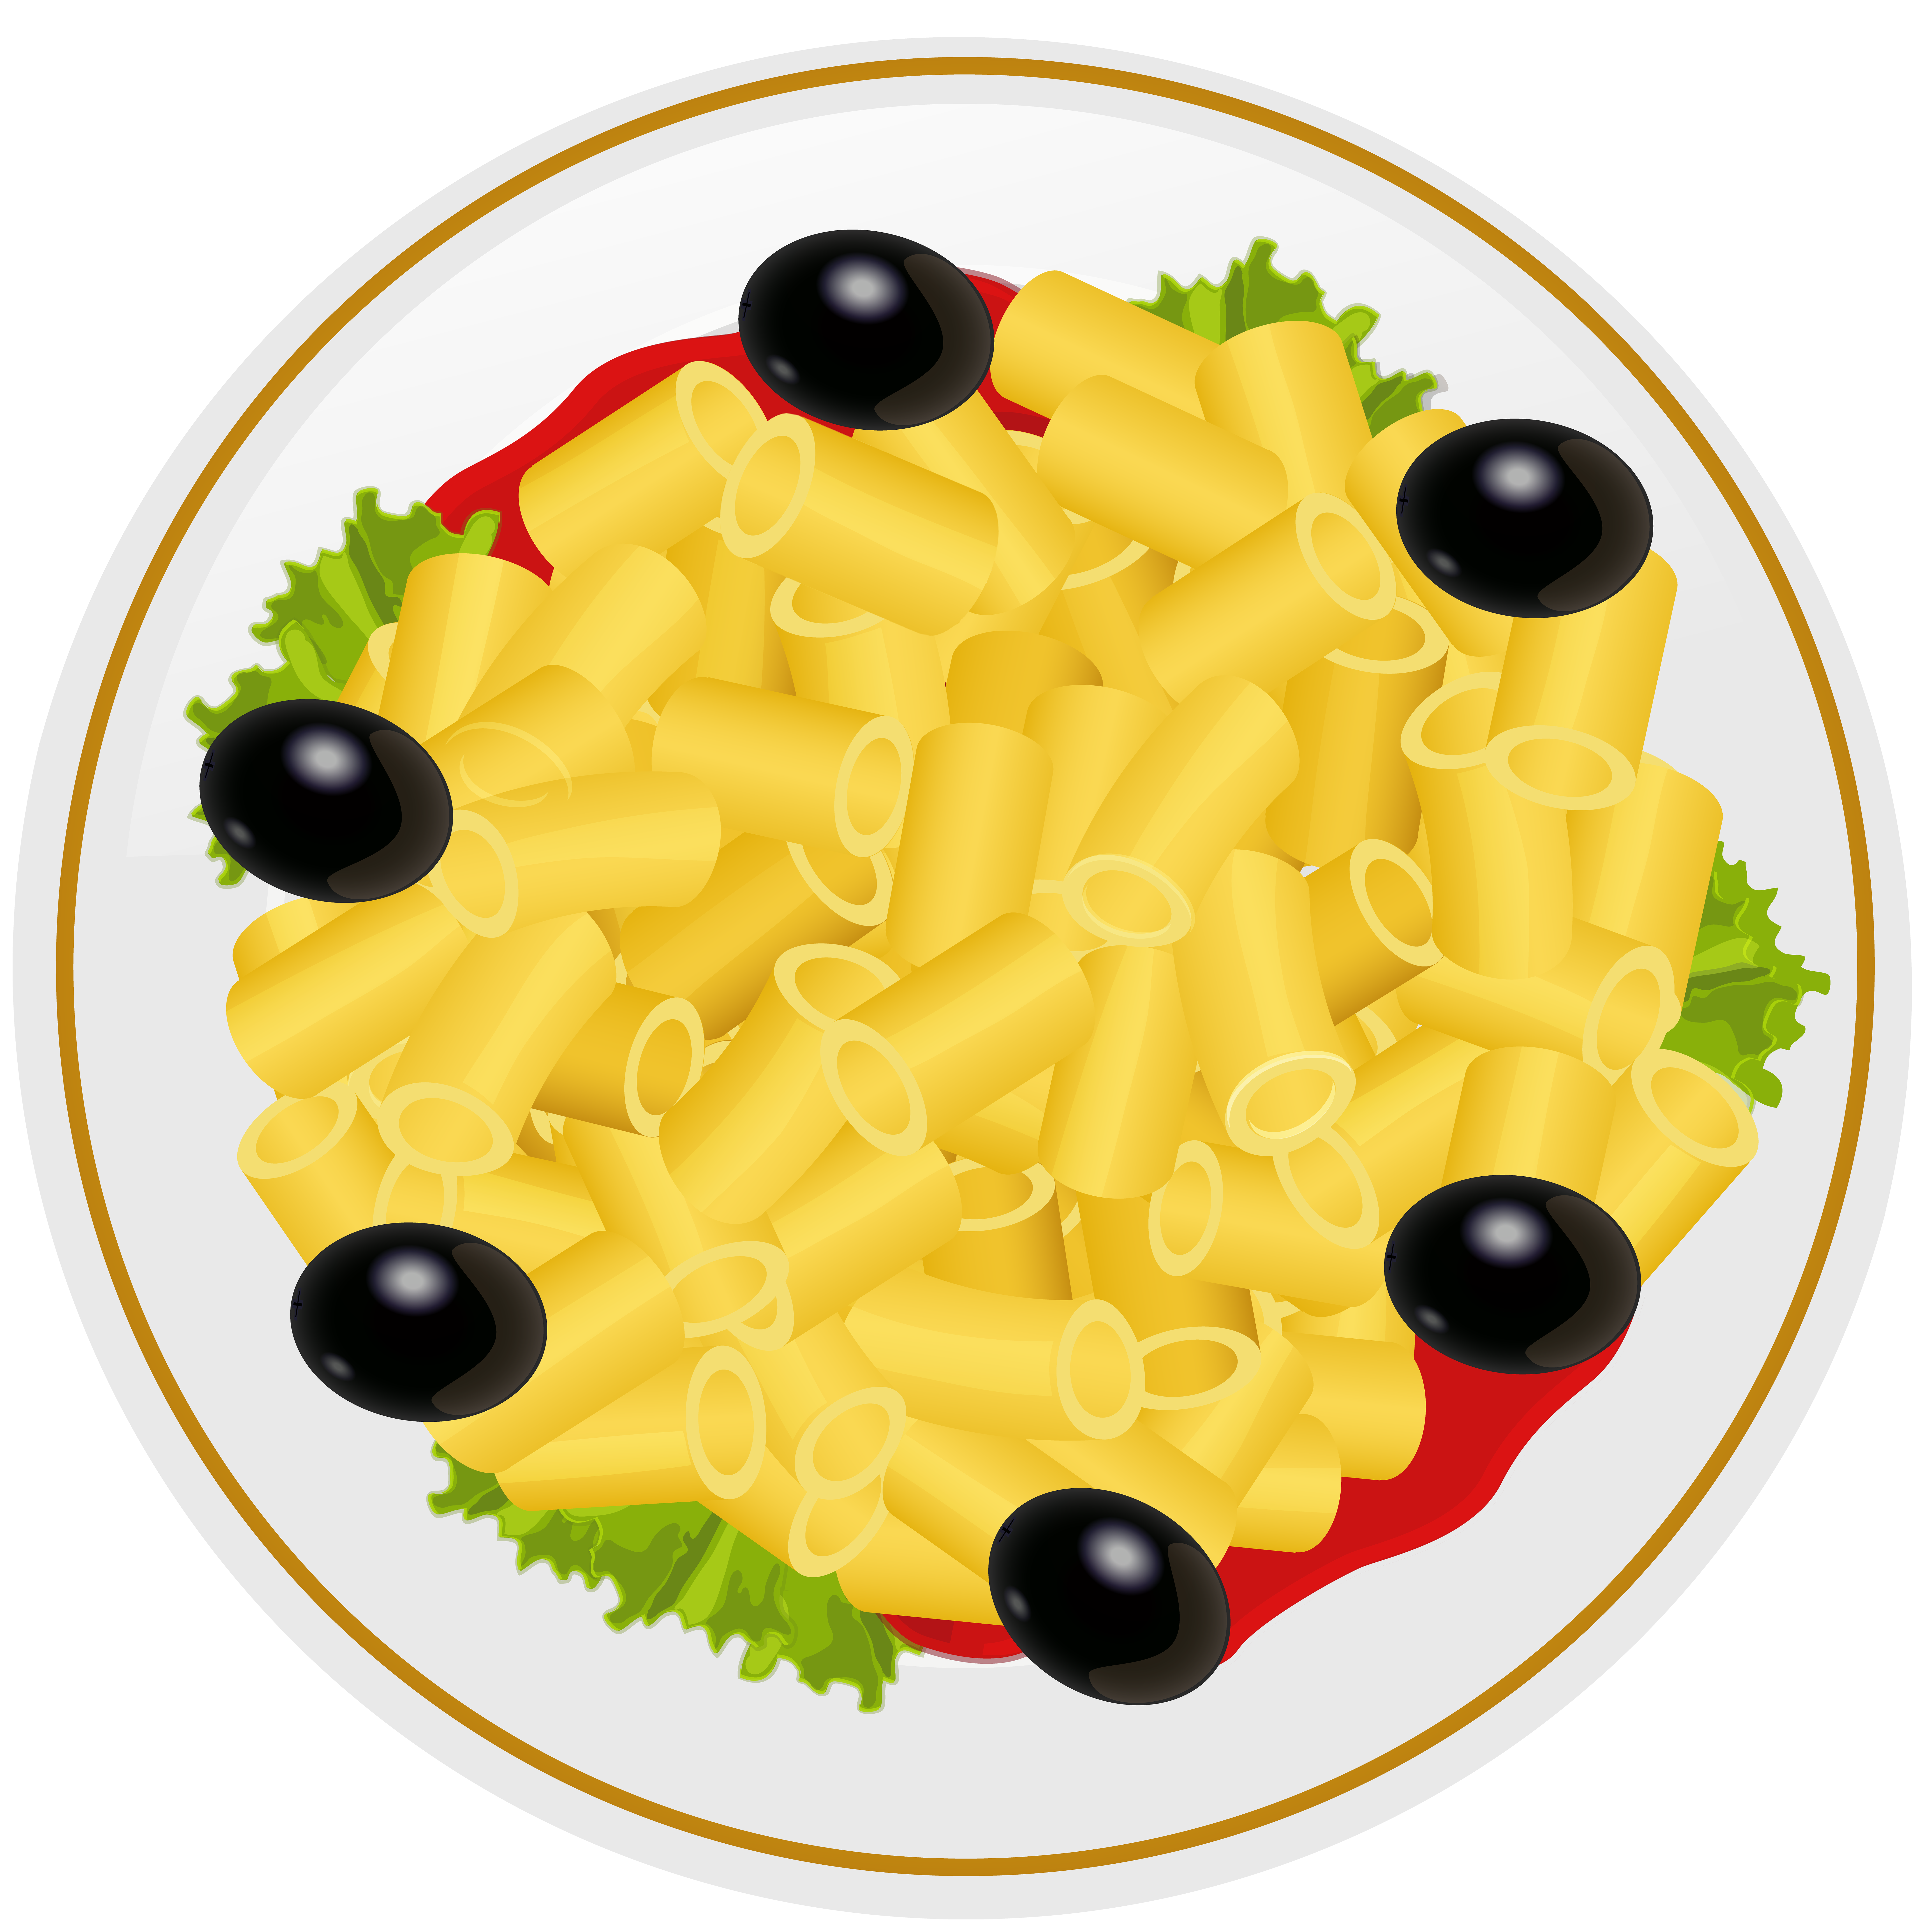 Pasta png clip art. Spaghetti clipart full plate food